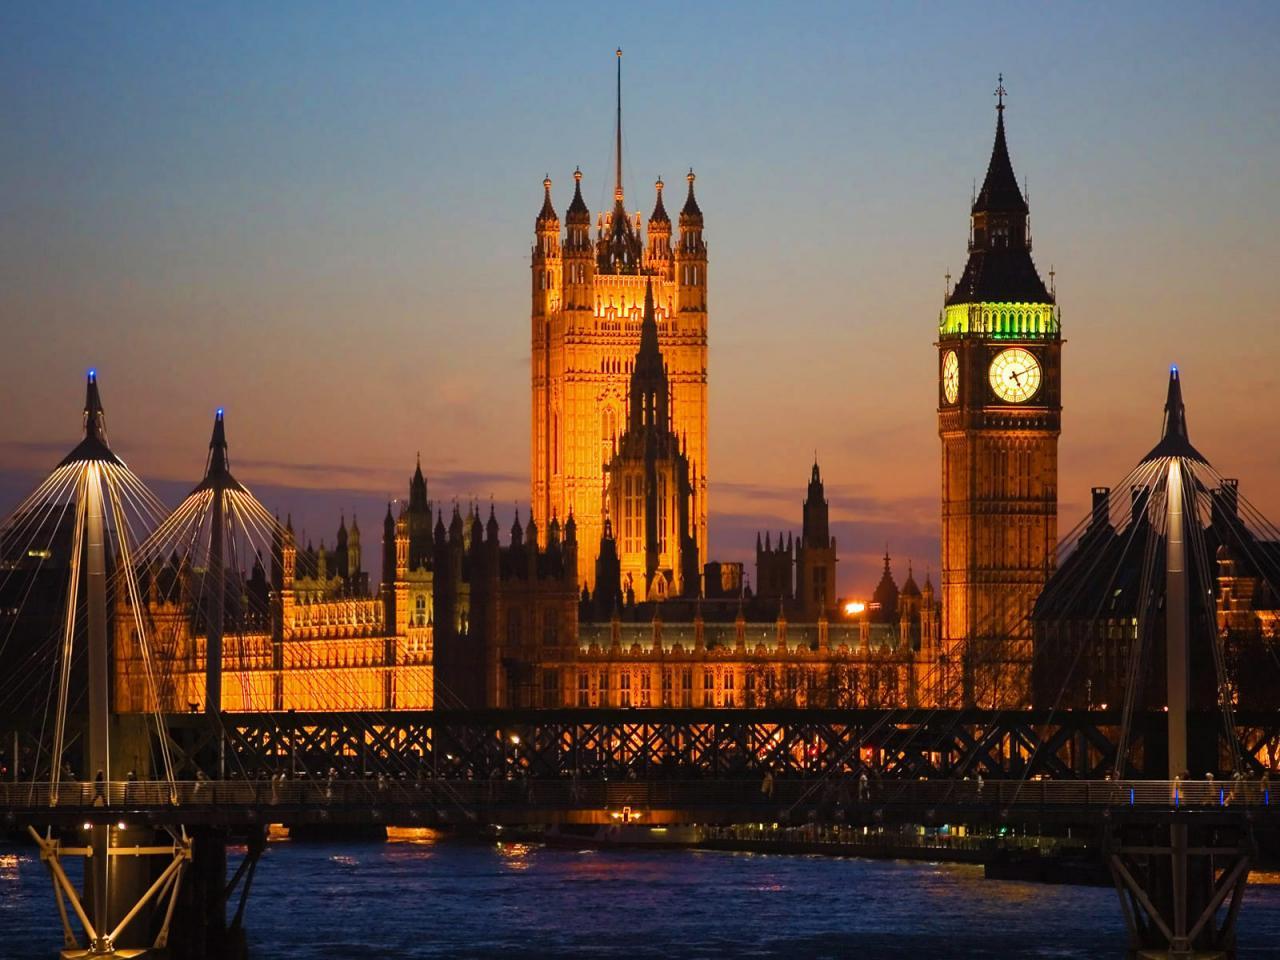 42 Big Ben London England Wallpaper On Wallpapersafari